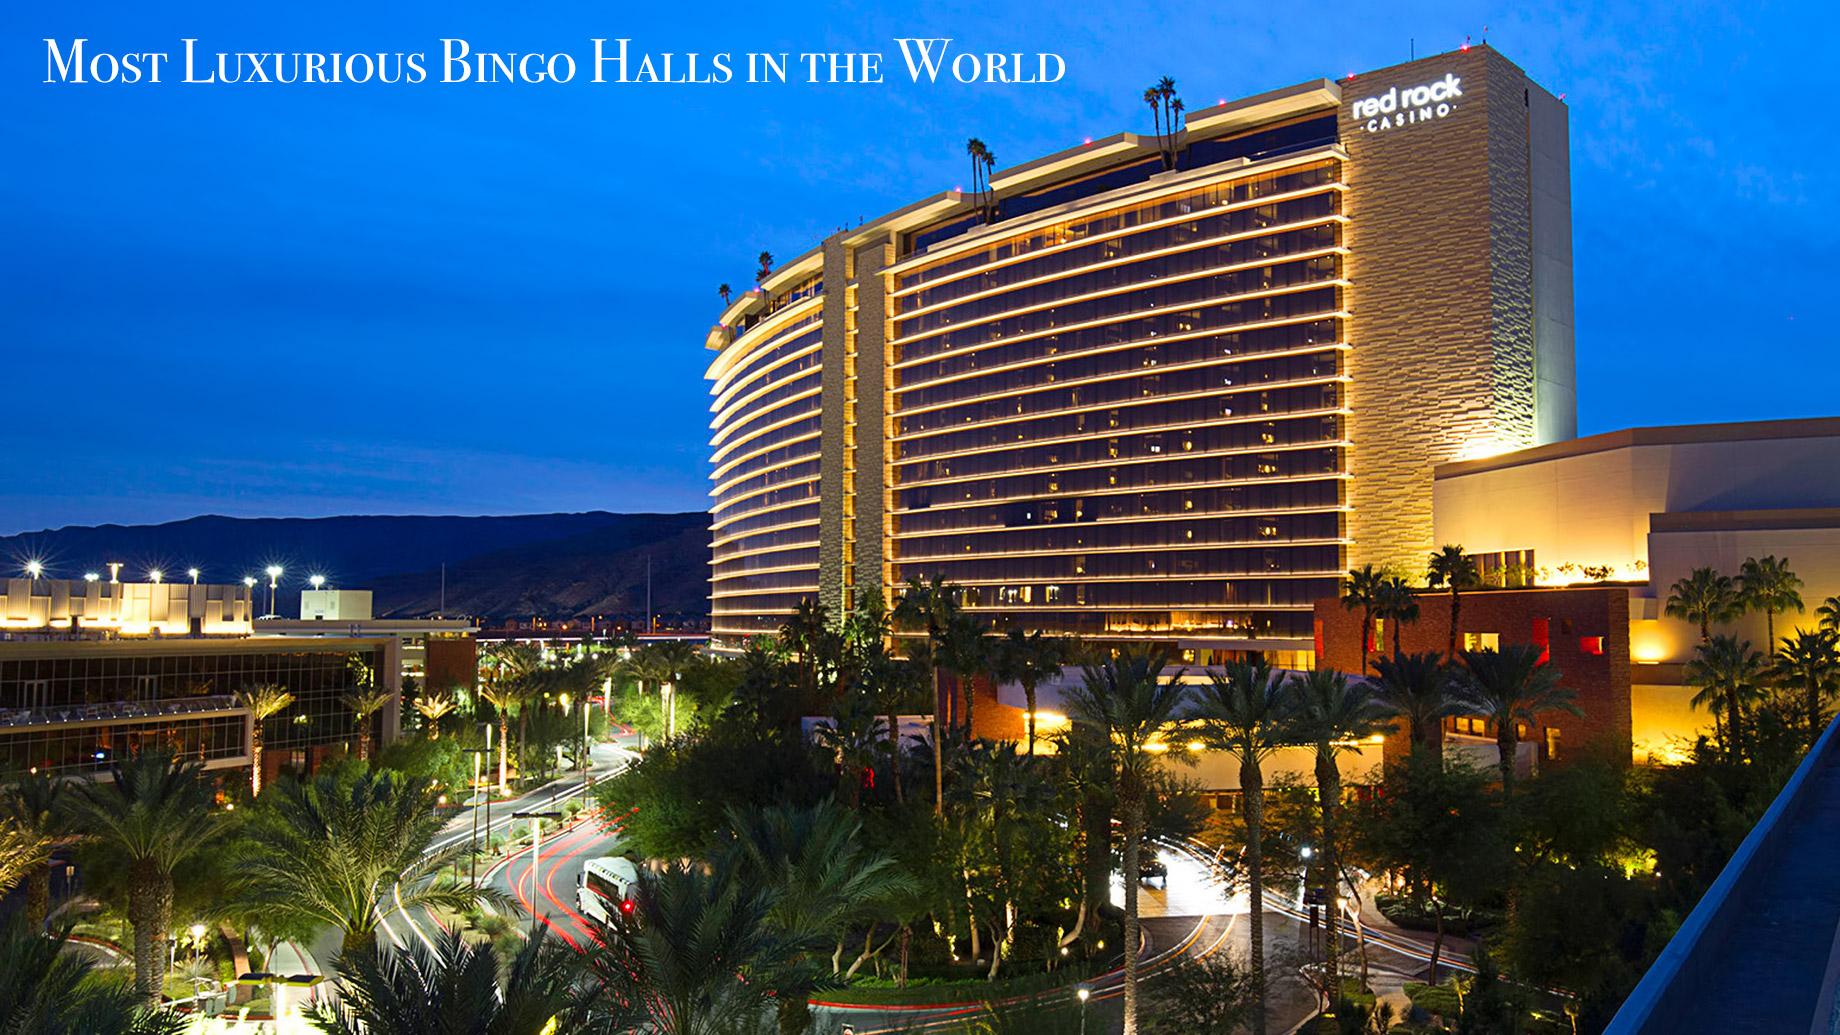 Most Luxurious Bingo Halls in the World